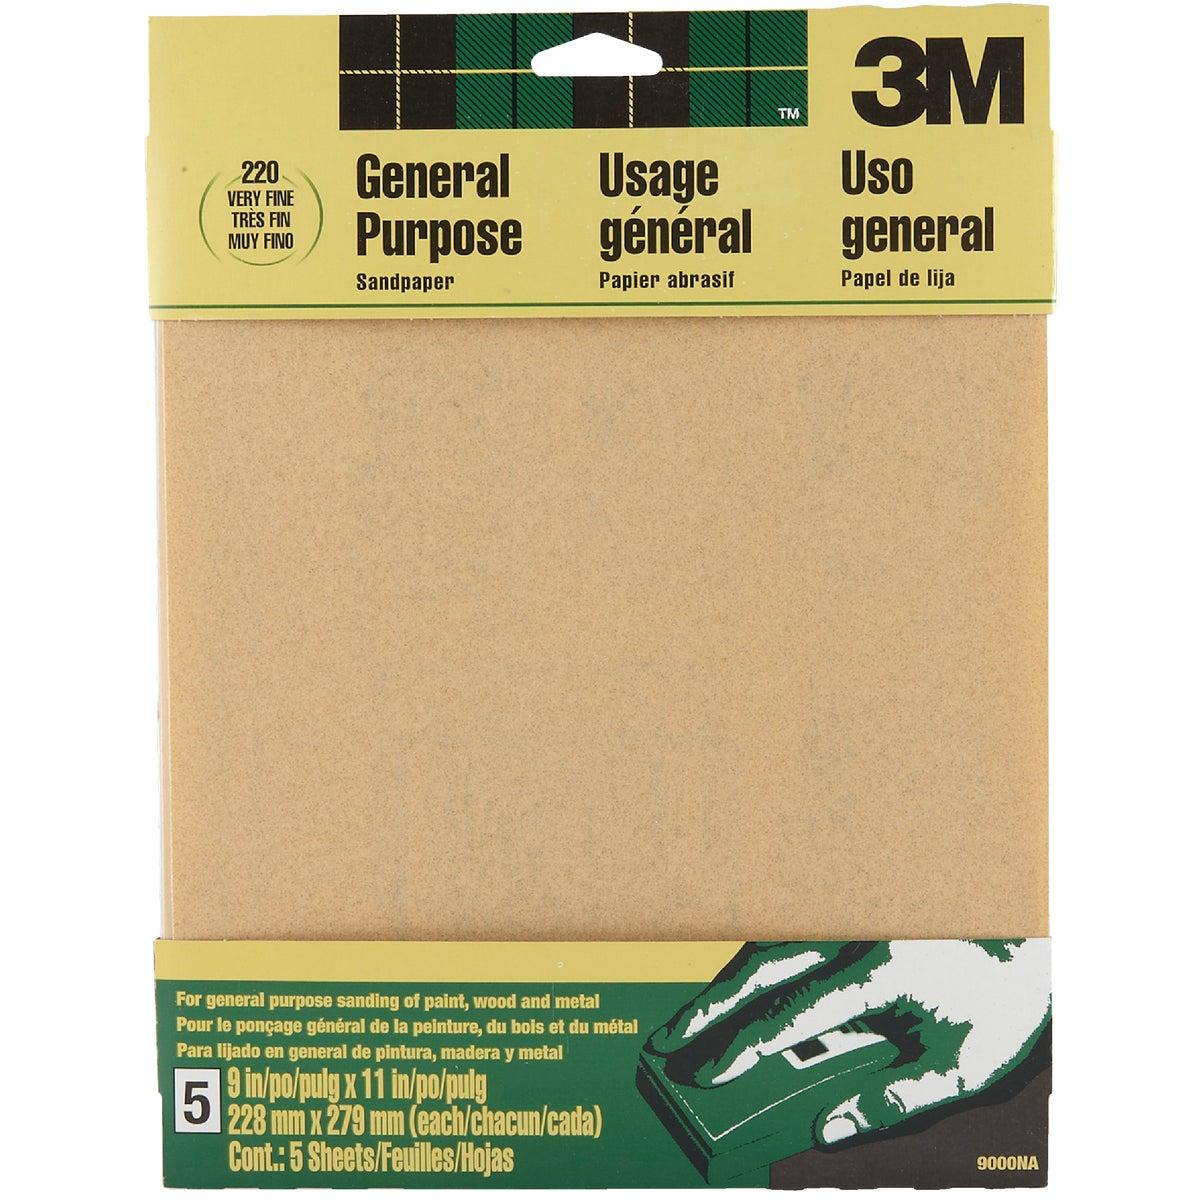 3M General-Purpose 9 In. x 11 In. 220 Grit Very Fine Sandpaper (5-Pack)